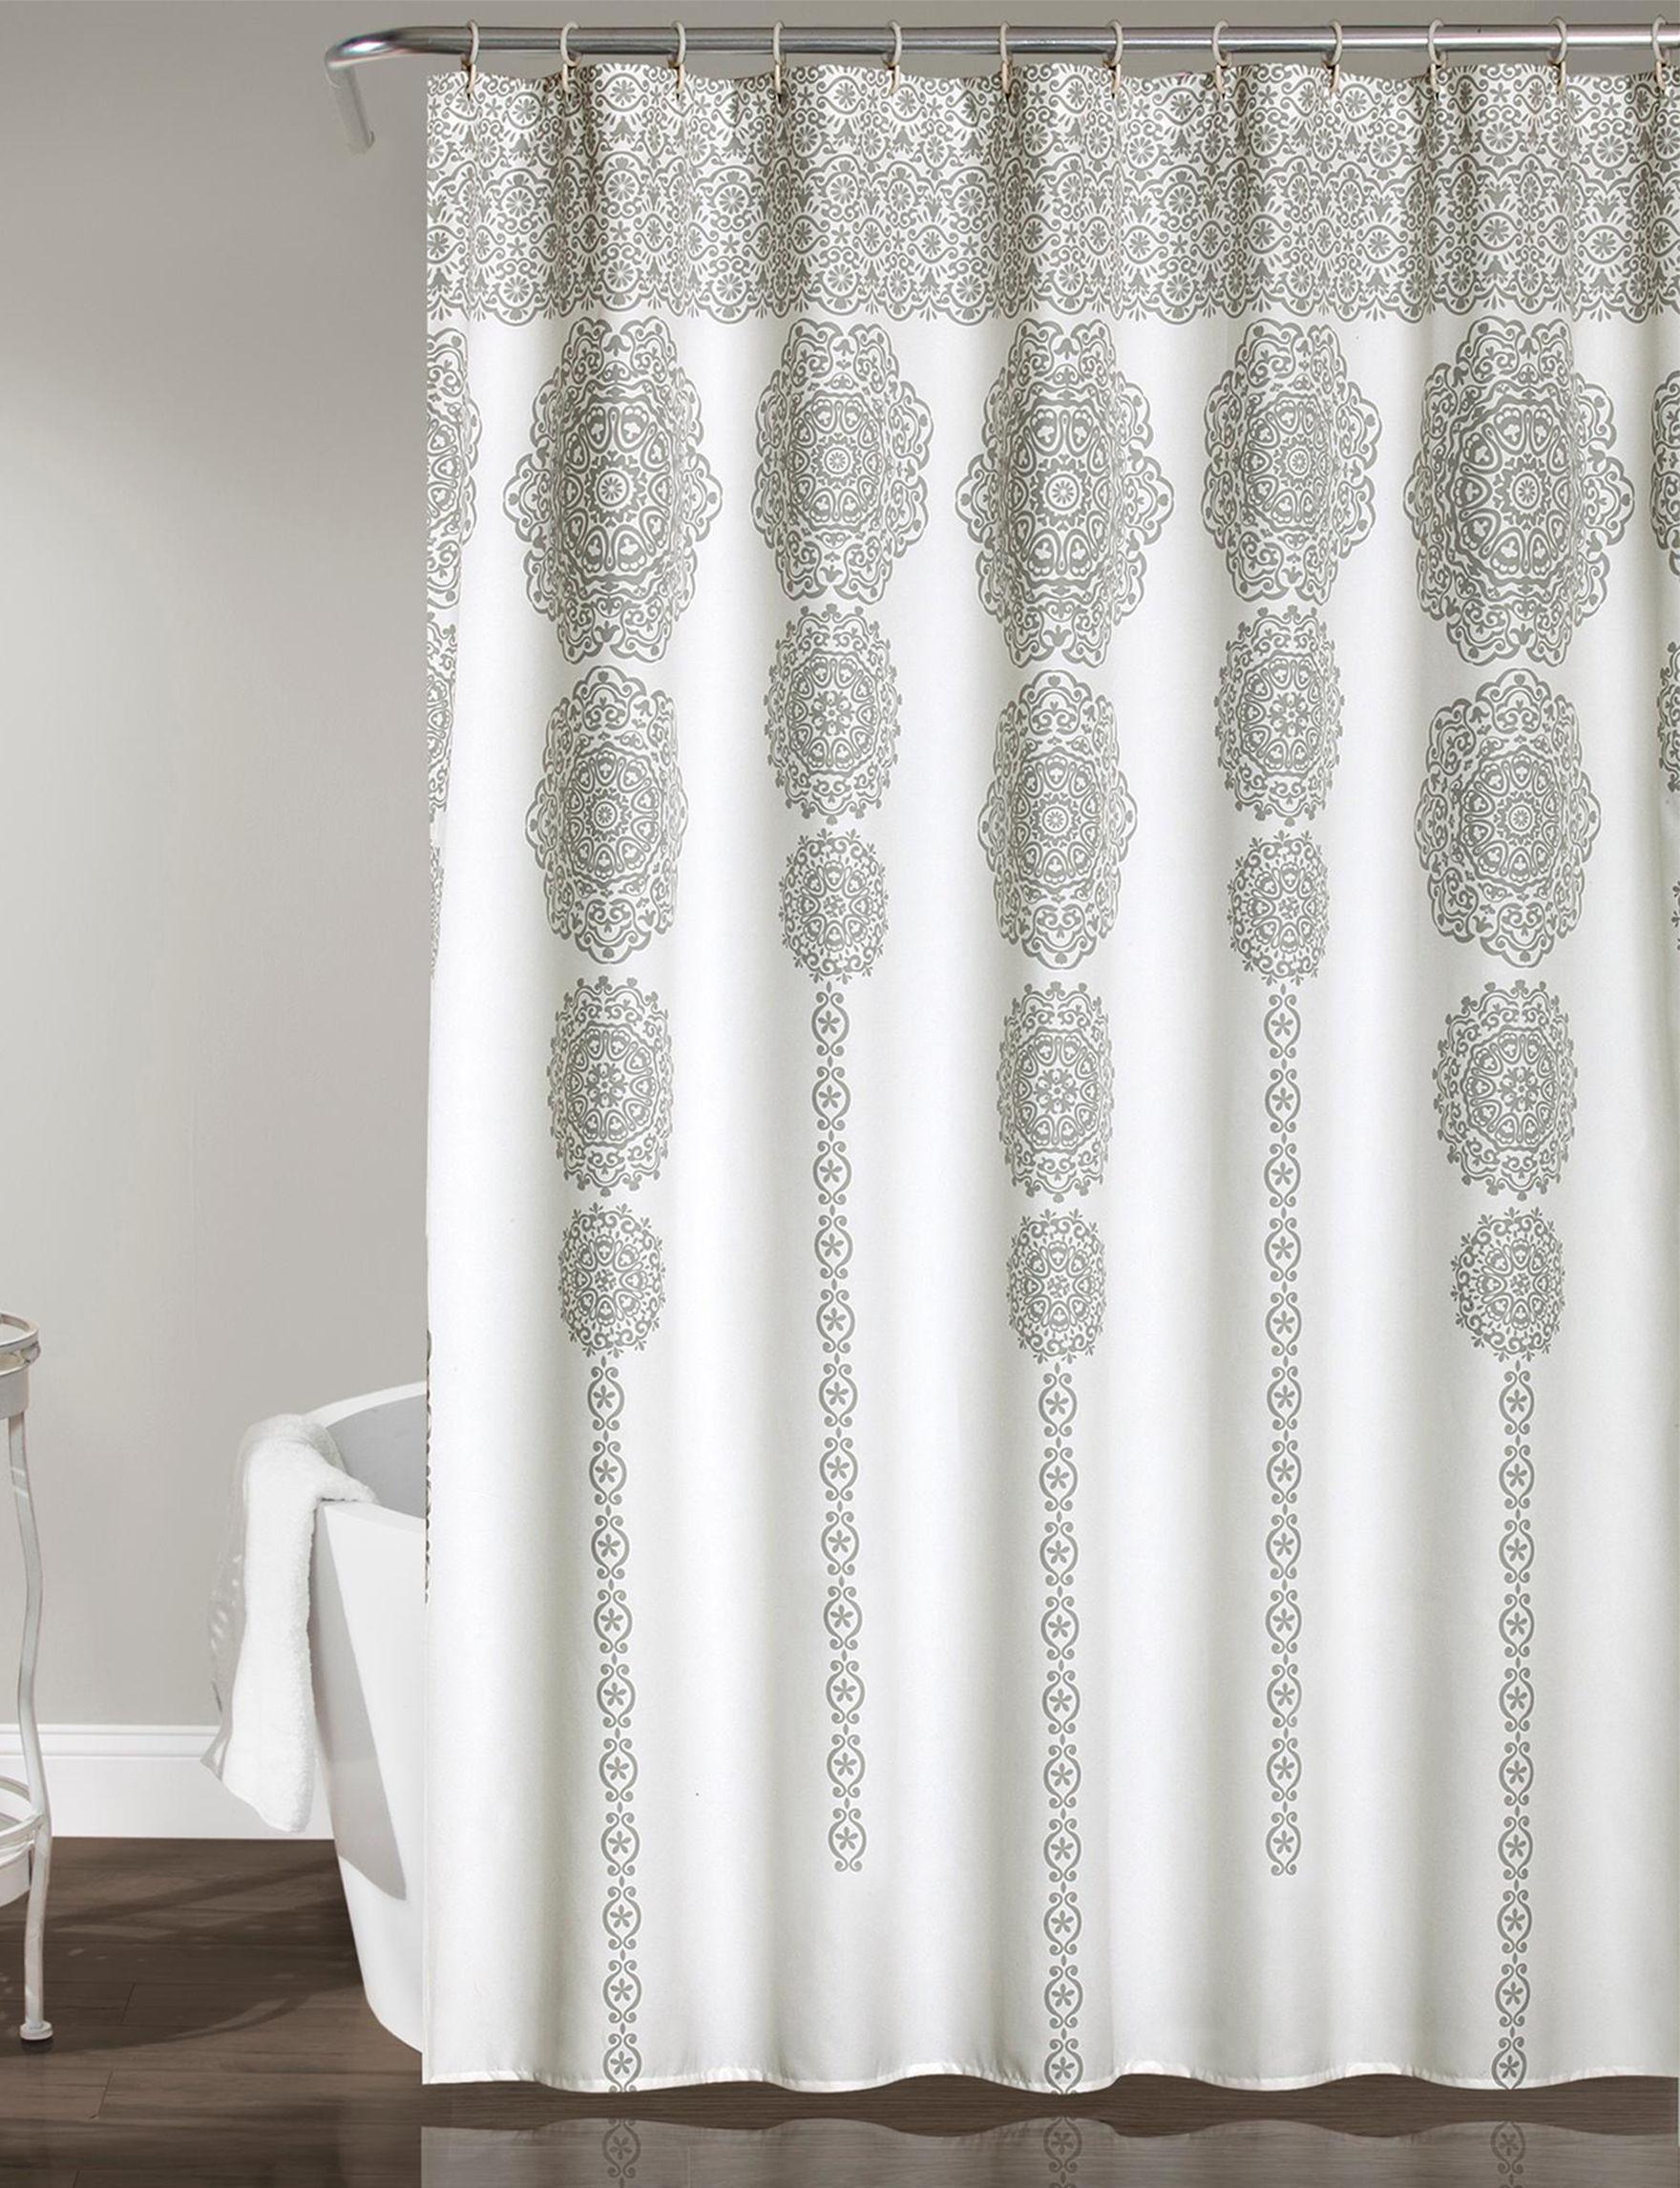 Lush Decor Grey Shower Curtains & Hooks